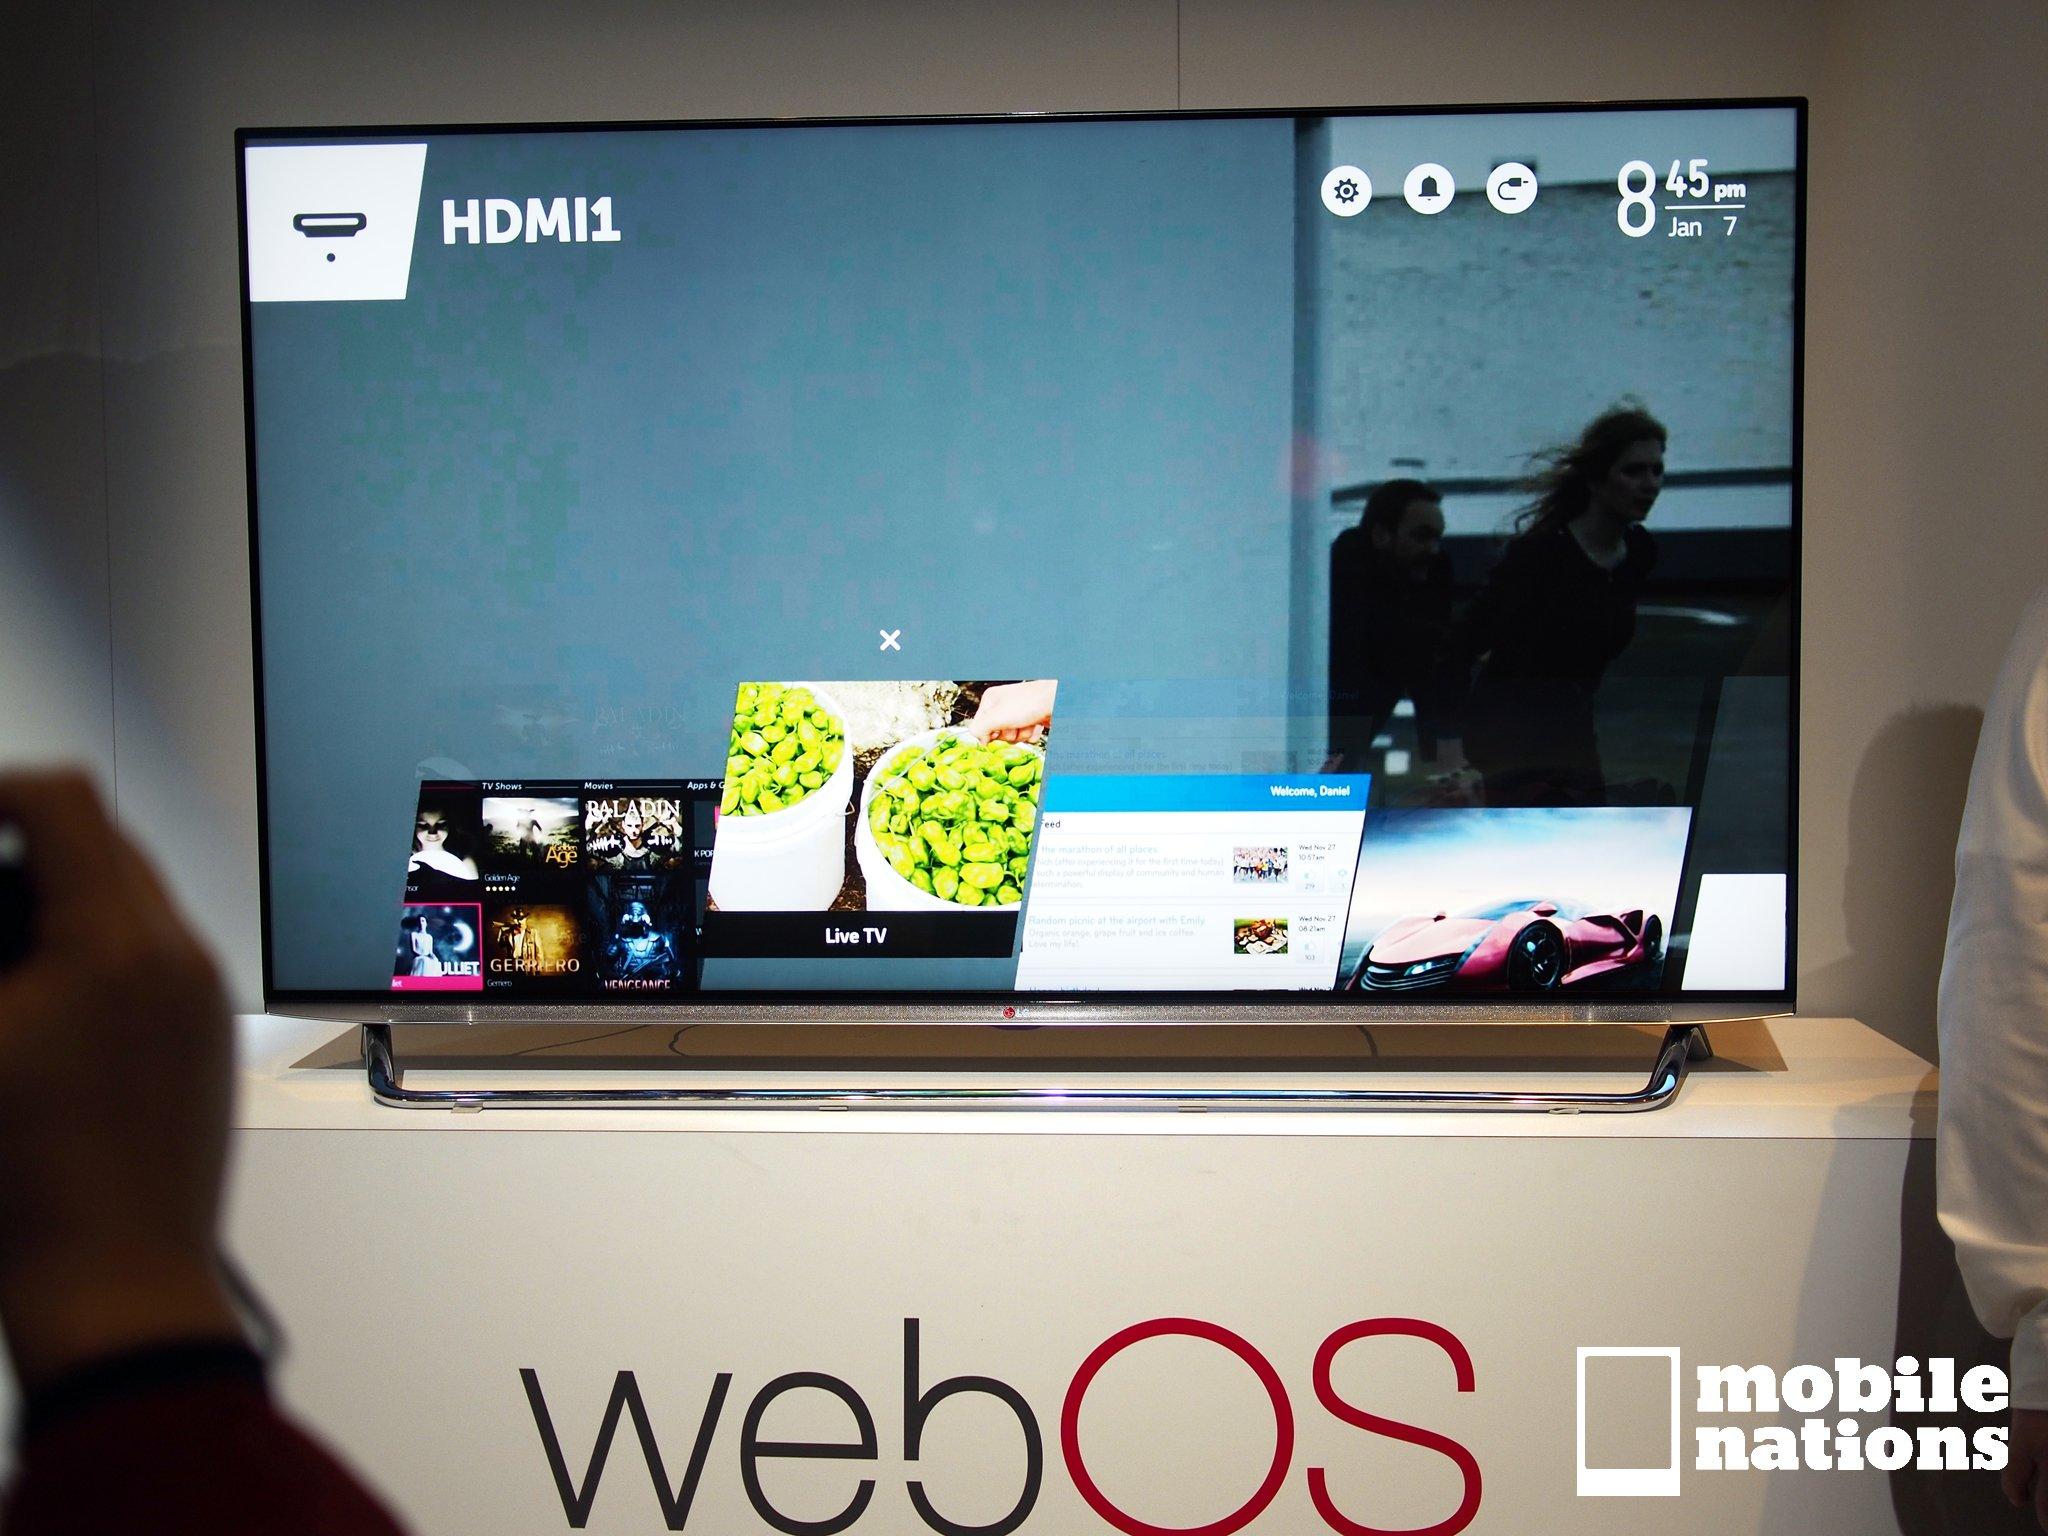 lg tv smartshare-webos application